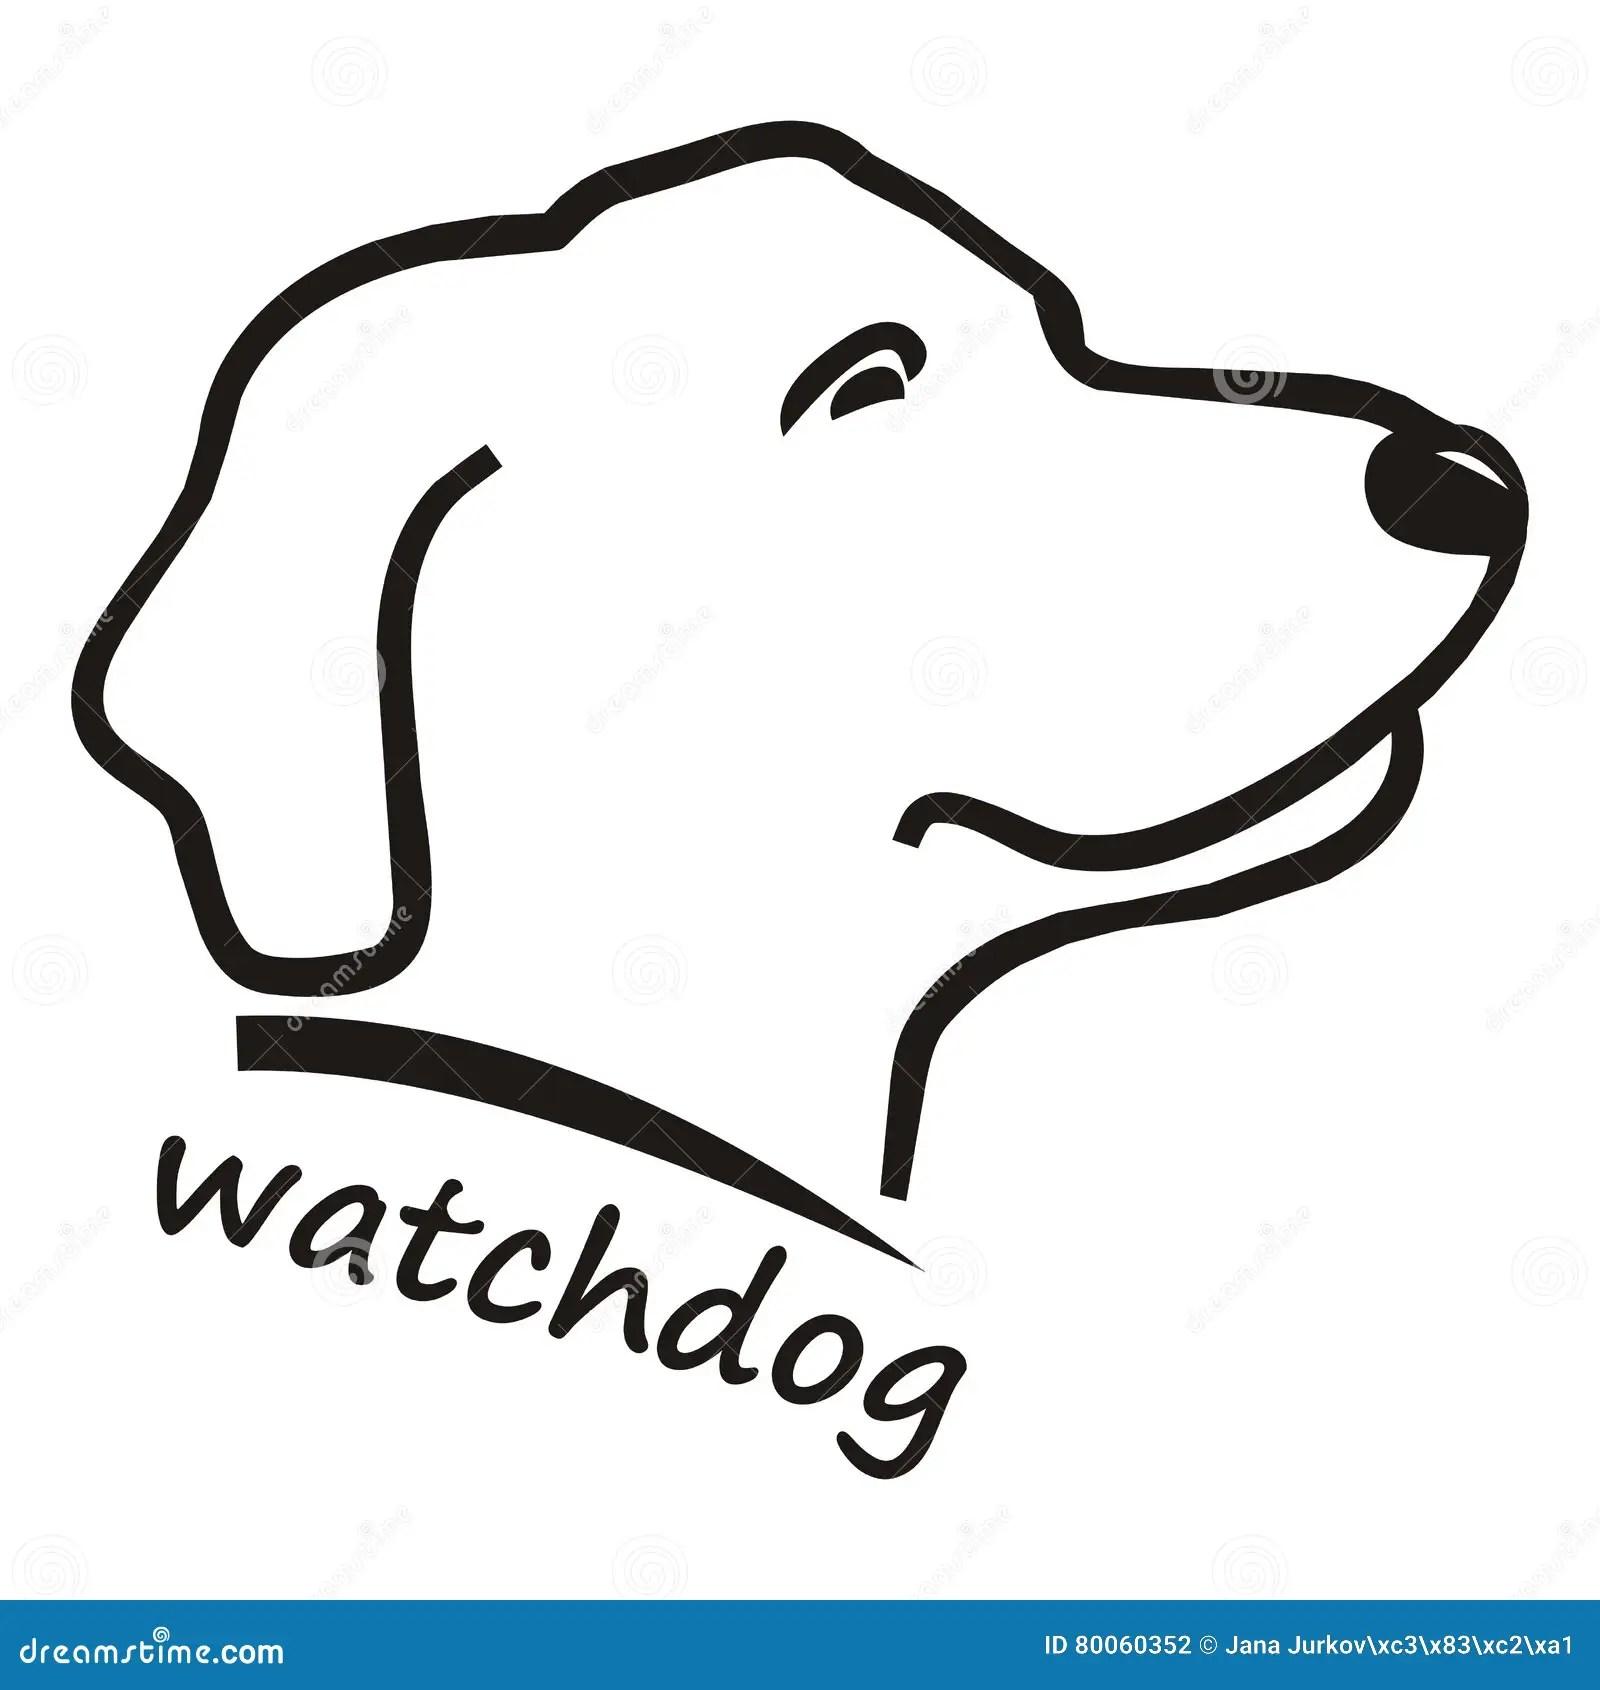 Watchdog Cartoons Illustrations Amp Vector Stock Images